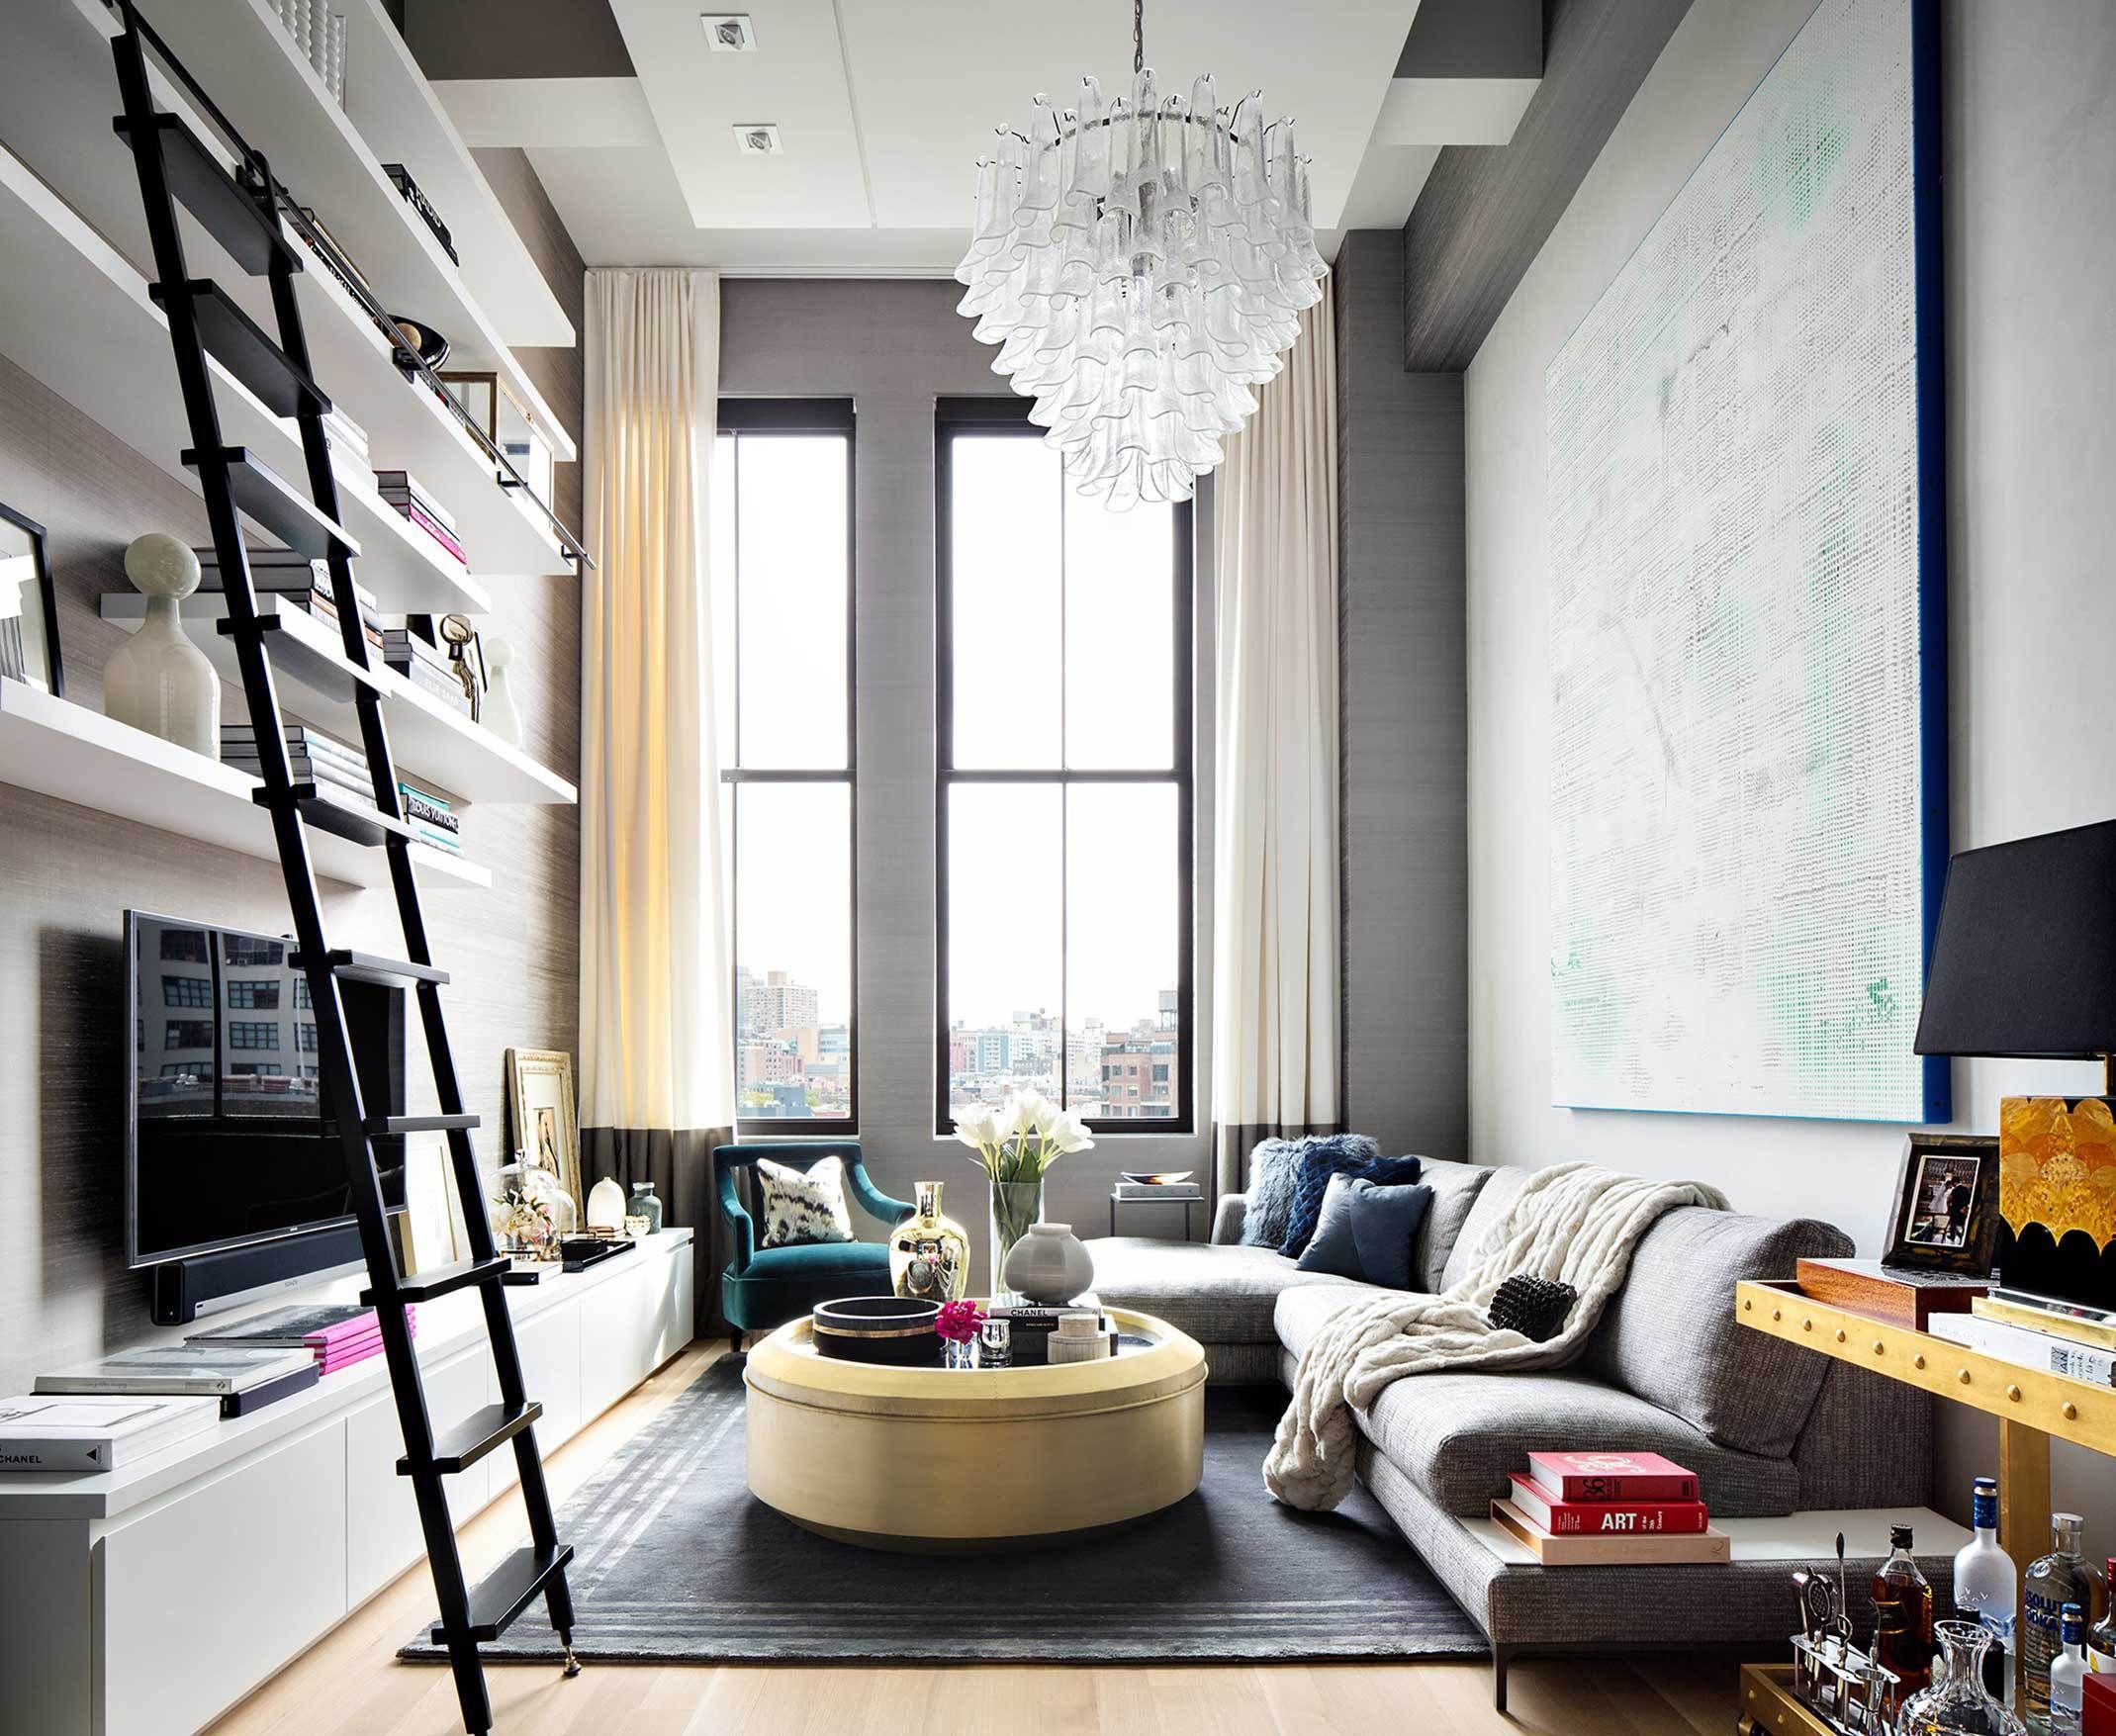 Pin de Sara S en DECO dining/living room  Interiores, Living